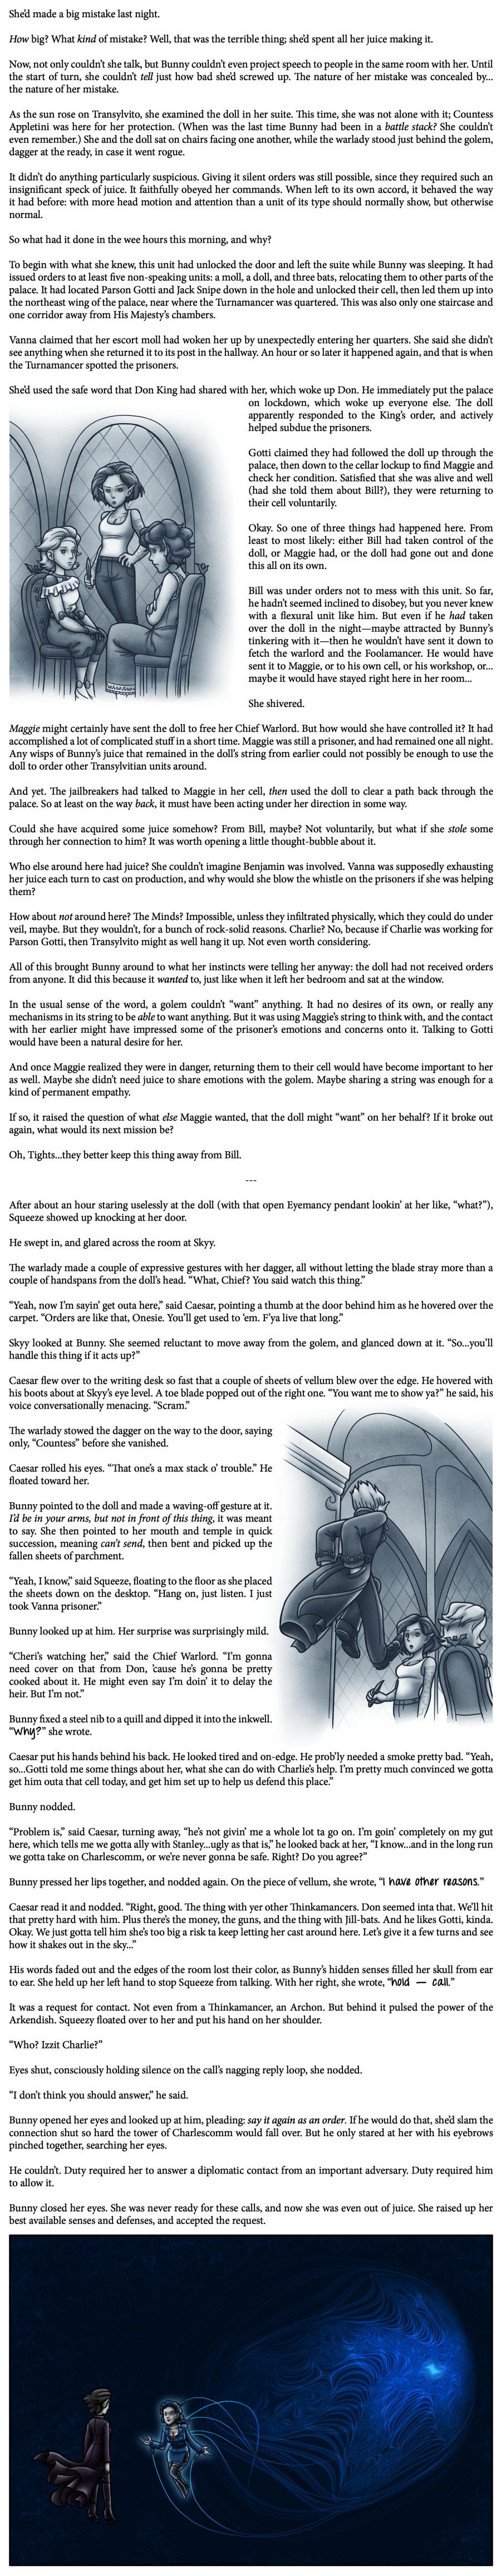 Comic - Book 4 - Page 46